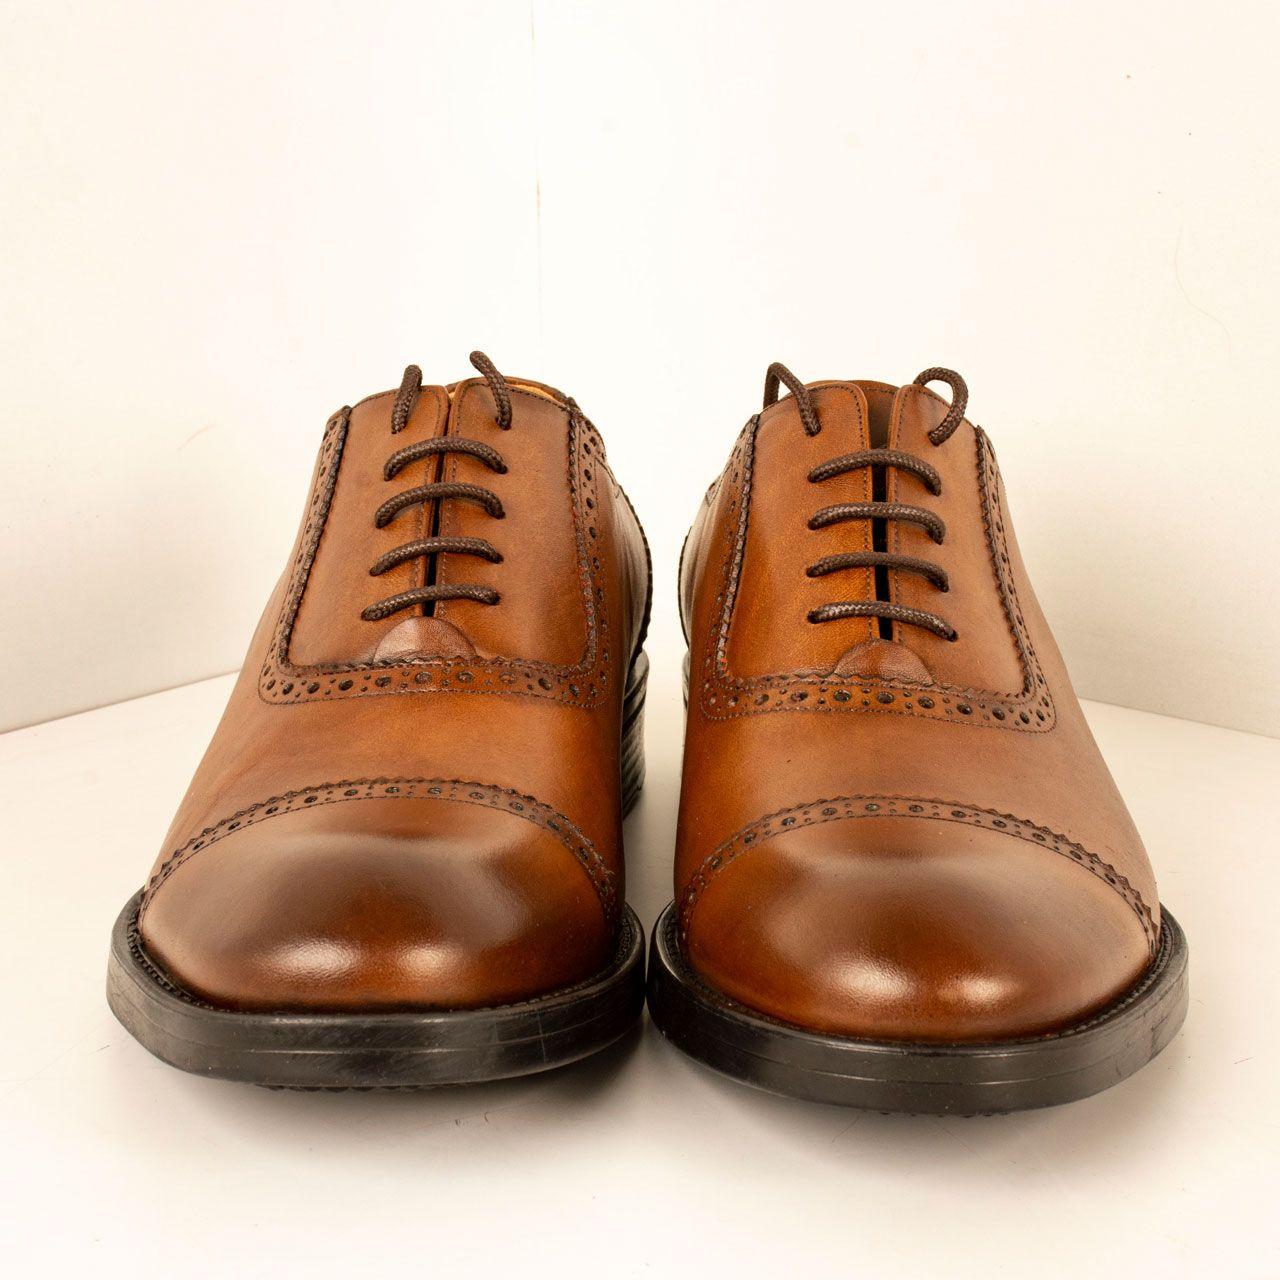 کفش مردانه پارینه چرم مدل SHO182-1 -  - 4